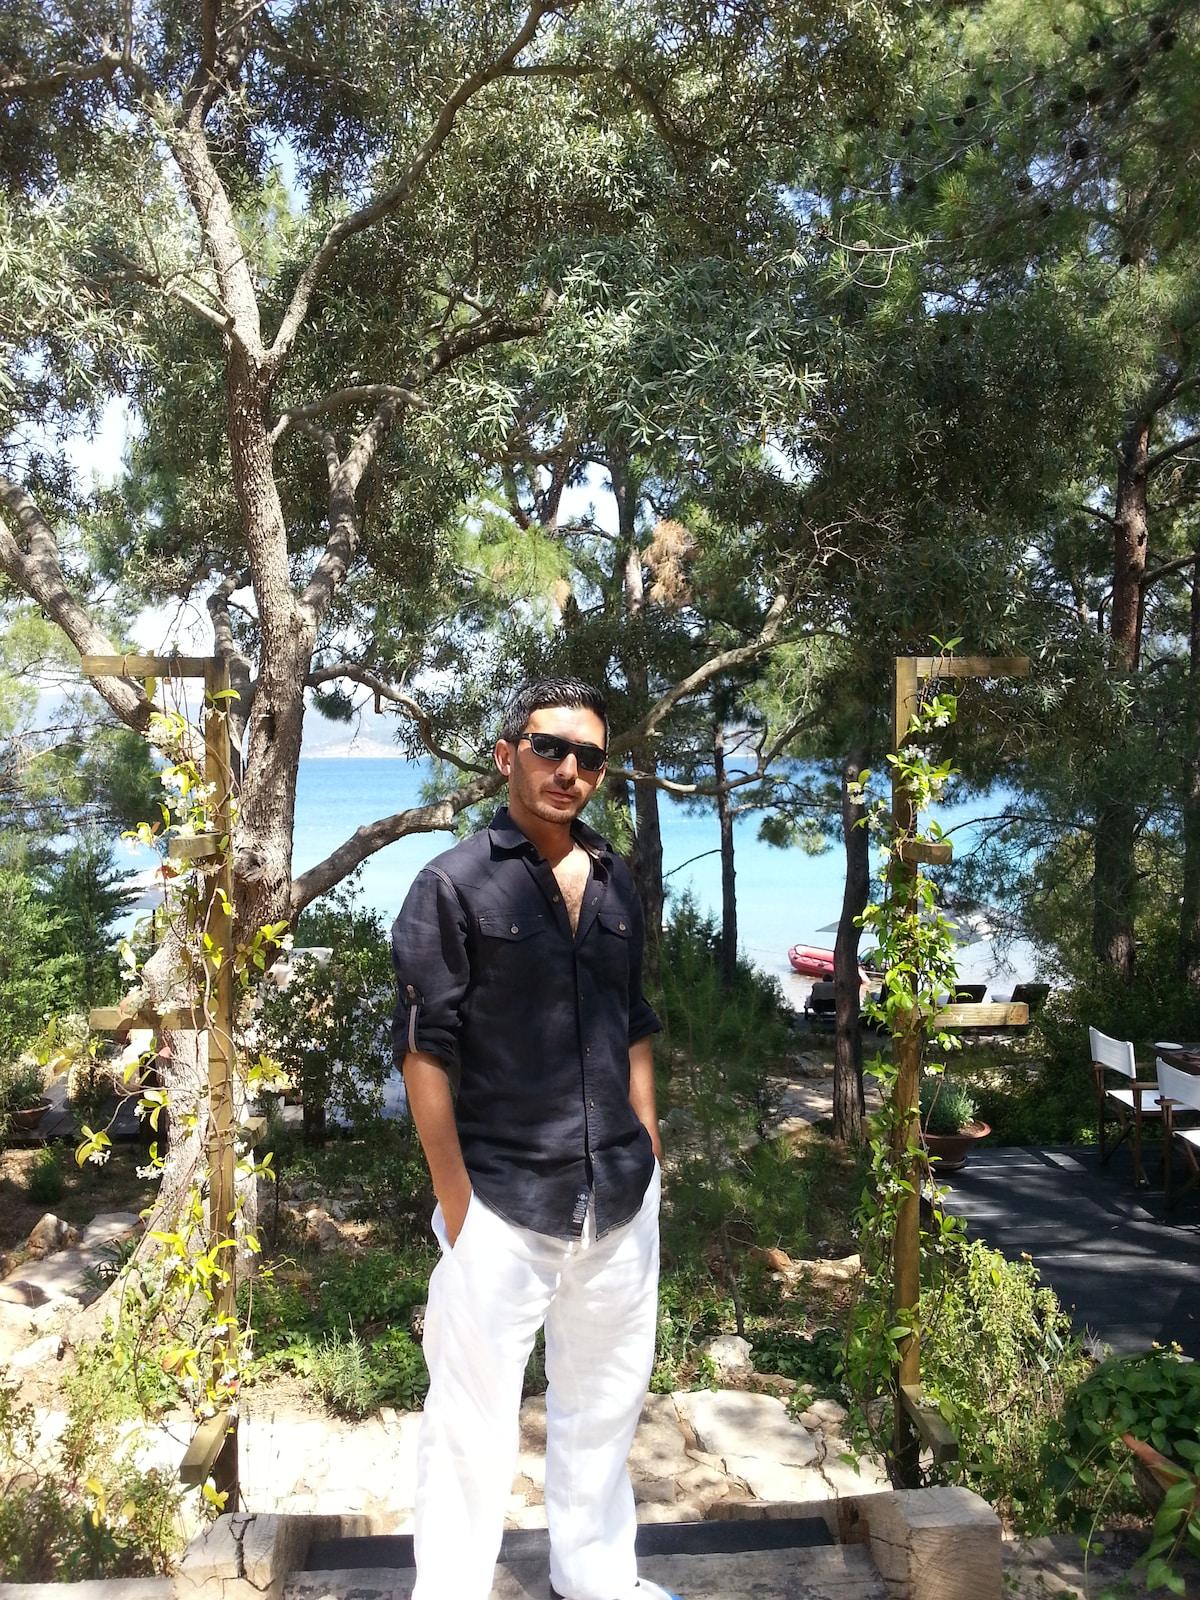 Ertan from Bodrum